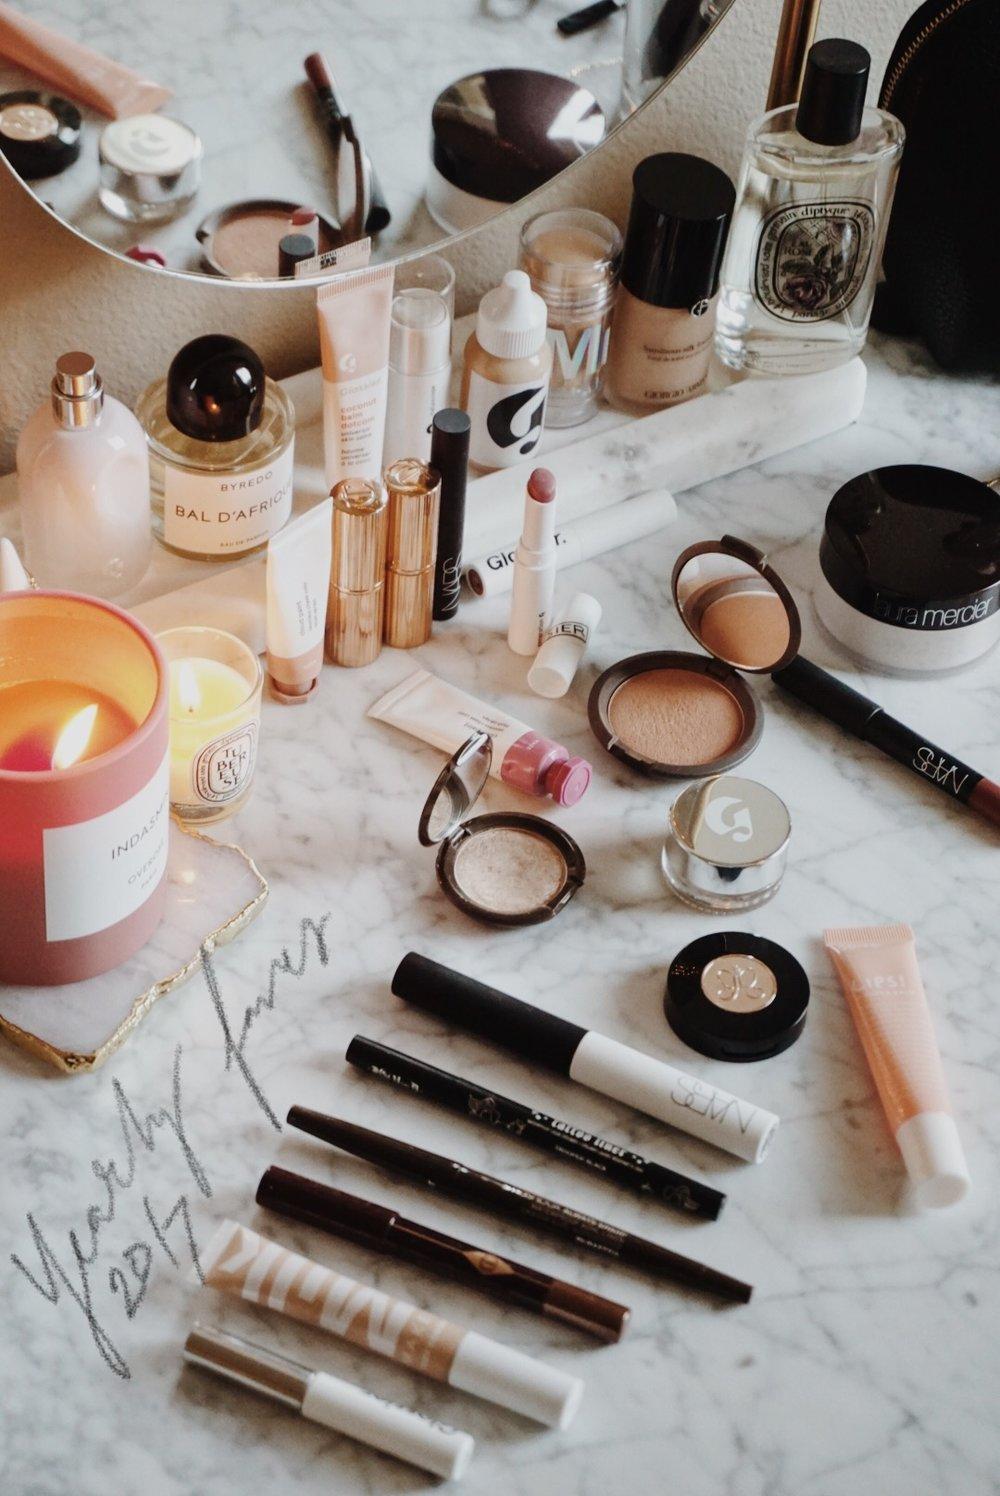 CHY Beauty Favorites - Glossier, Giorgio Armani, BECCA, Go-To Skincare, Charlotte Tilbury, Byredo, Tarte, Kat Von D